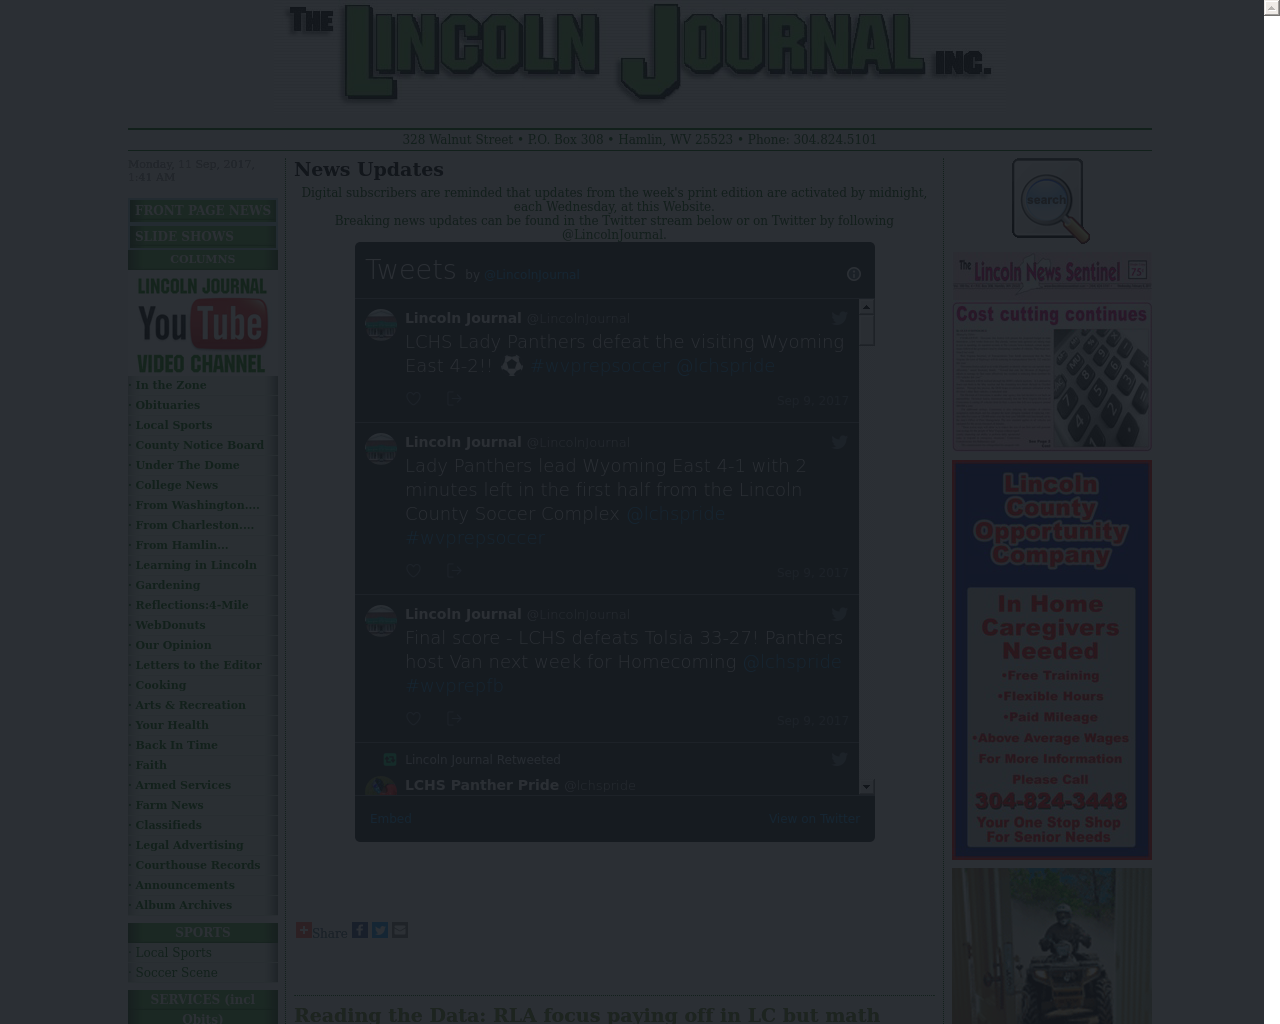 Lincolnjournalinc.com-Advertising-Reviews-Pricing